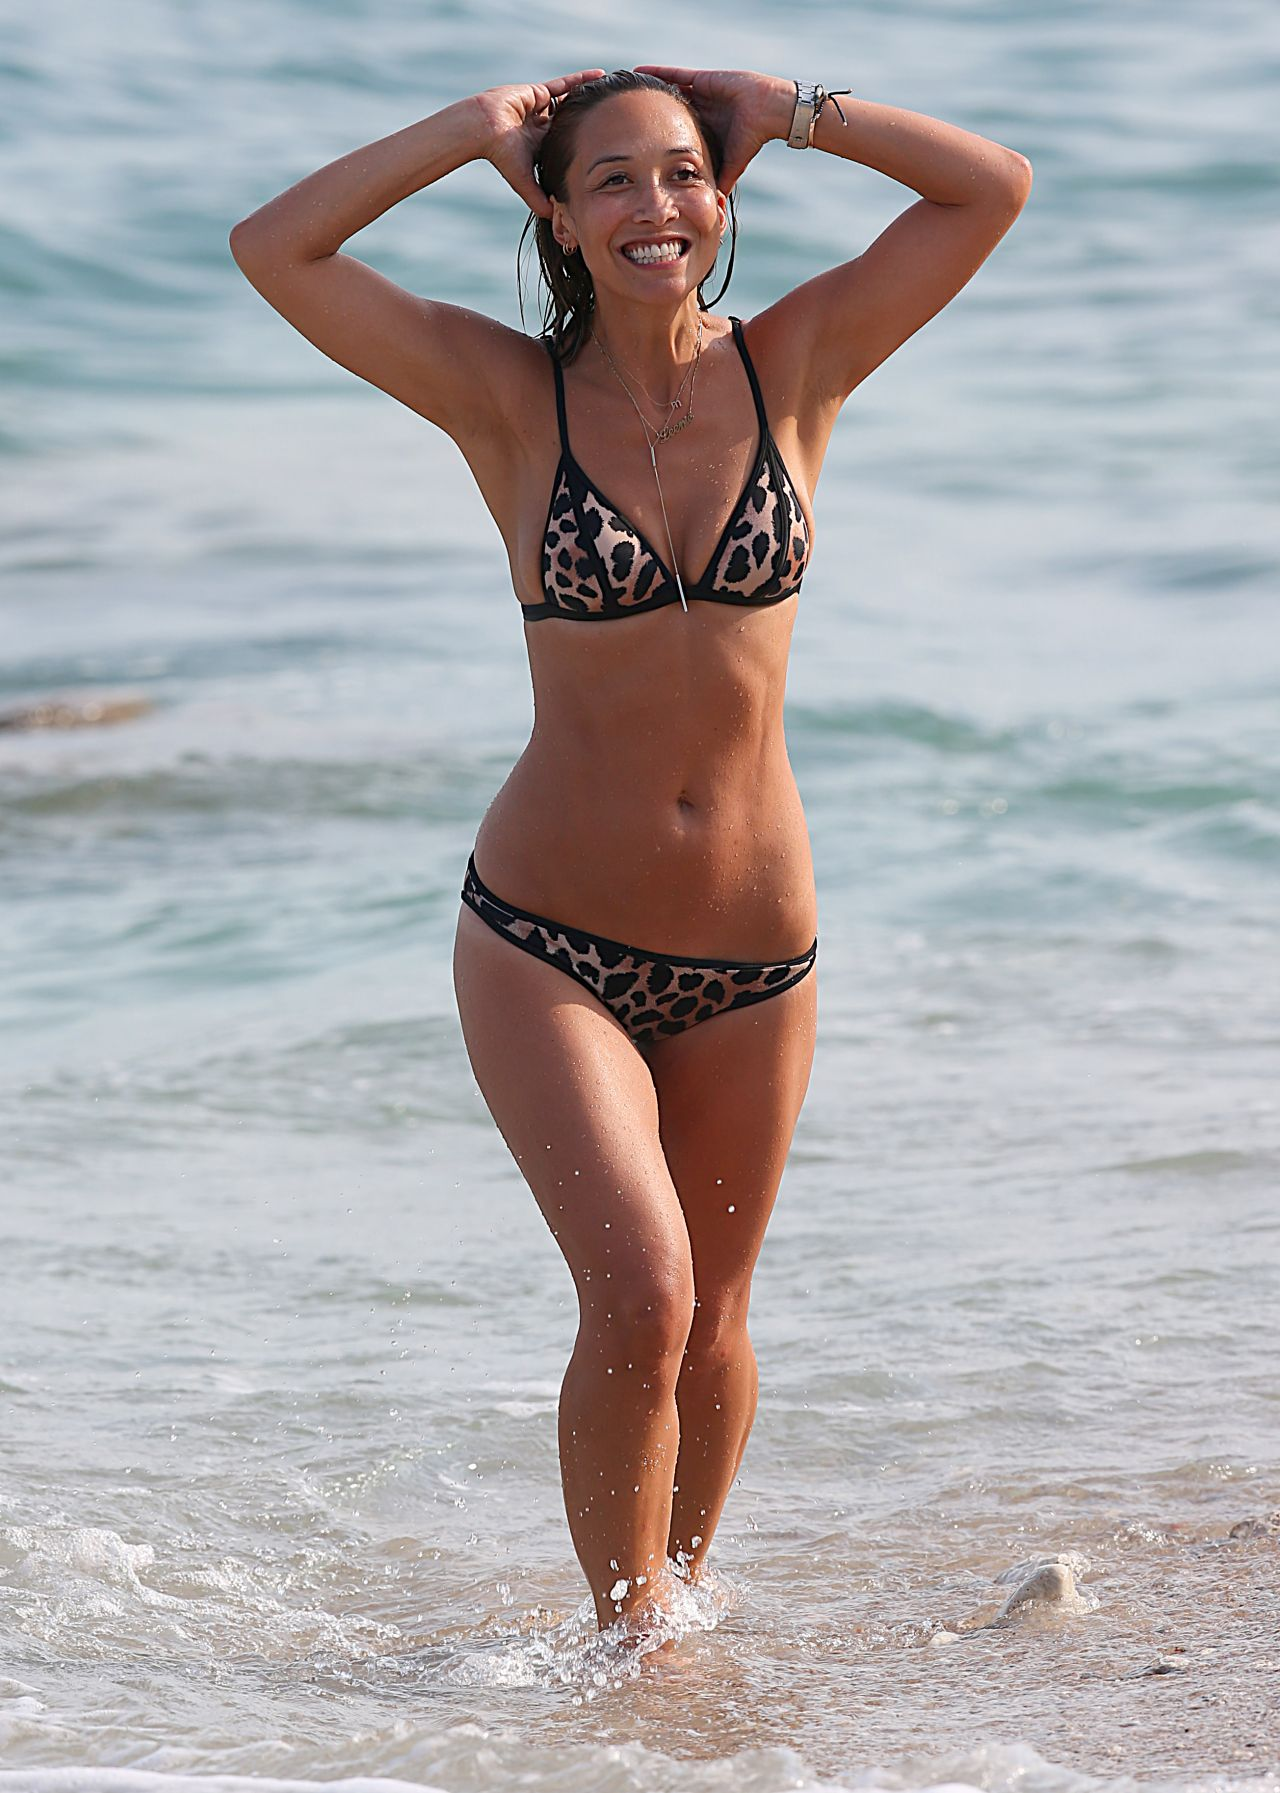 Myleene klass in bikini on the beach in portugal